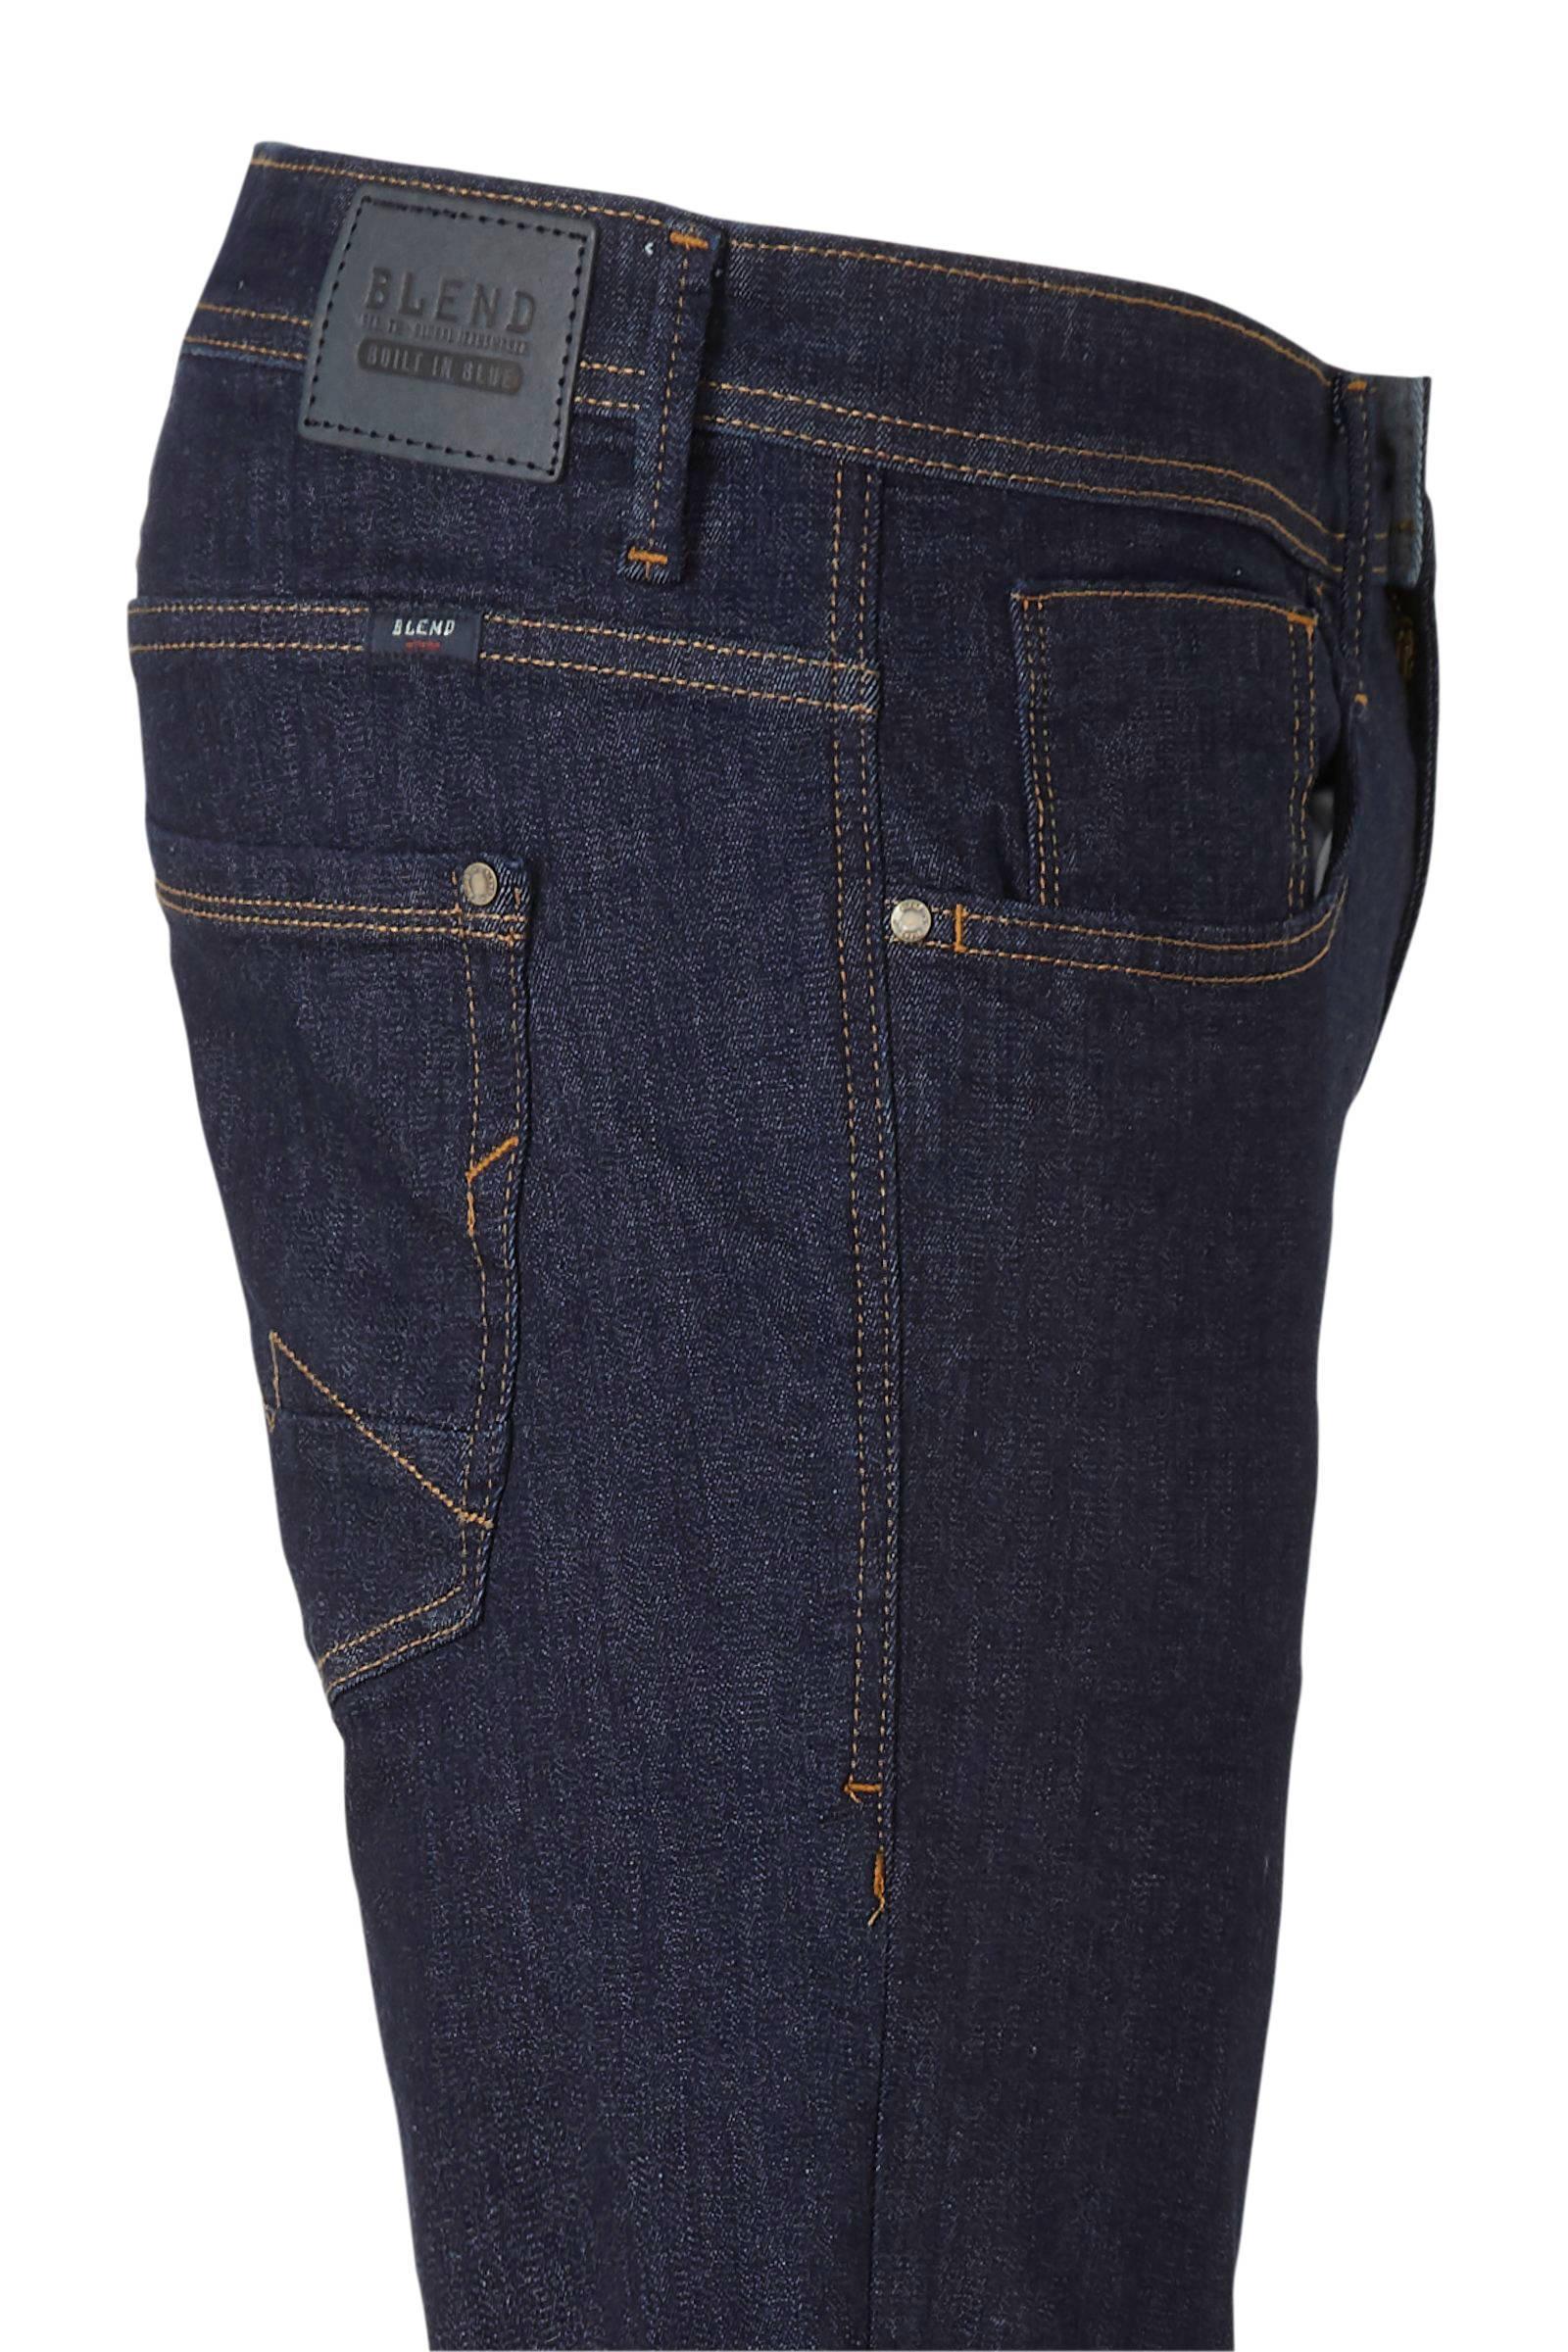 Blend Denim Slim Fit Jeans Multiflexjet Dark Blue voor heren